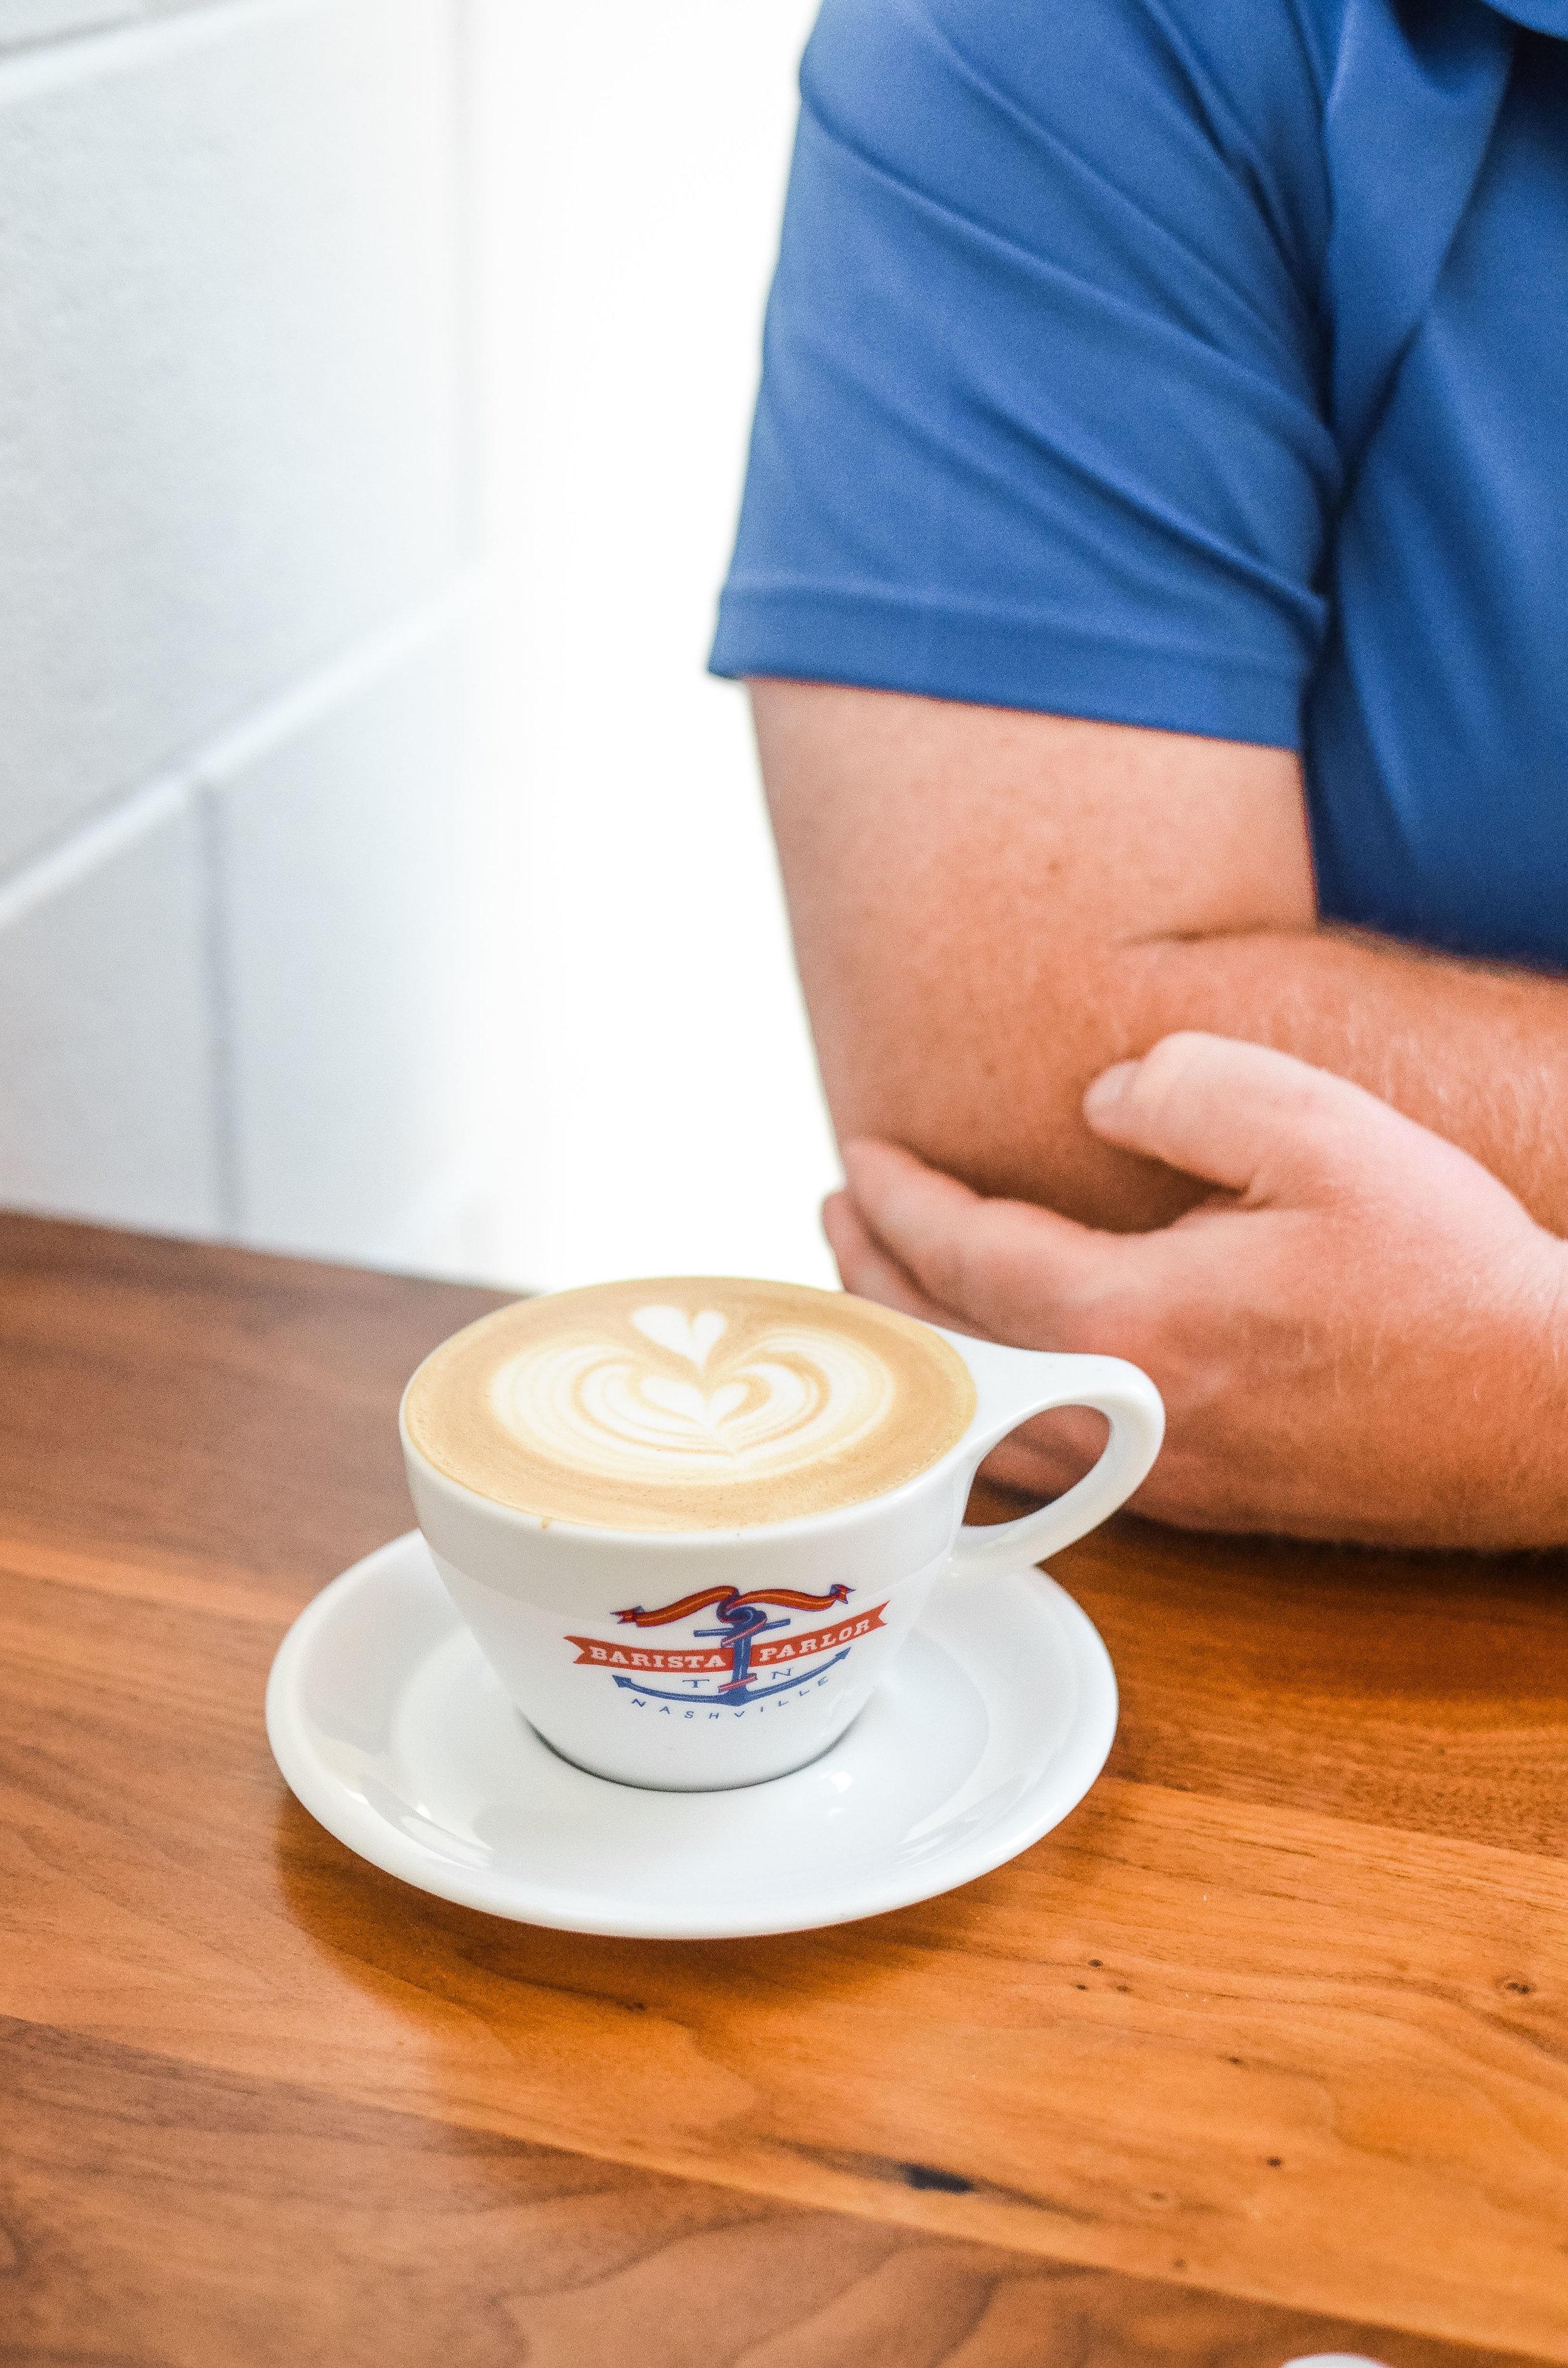 Wendling_Boyd_Barista_Parlor_Germantown_Nashville_Tennessee_Coffee_Culture_-11.jpg